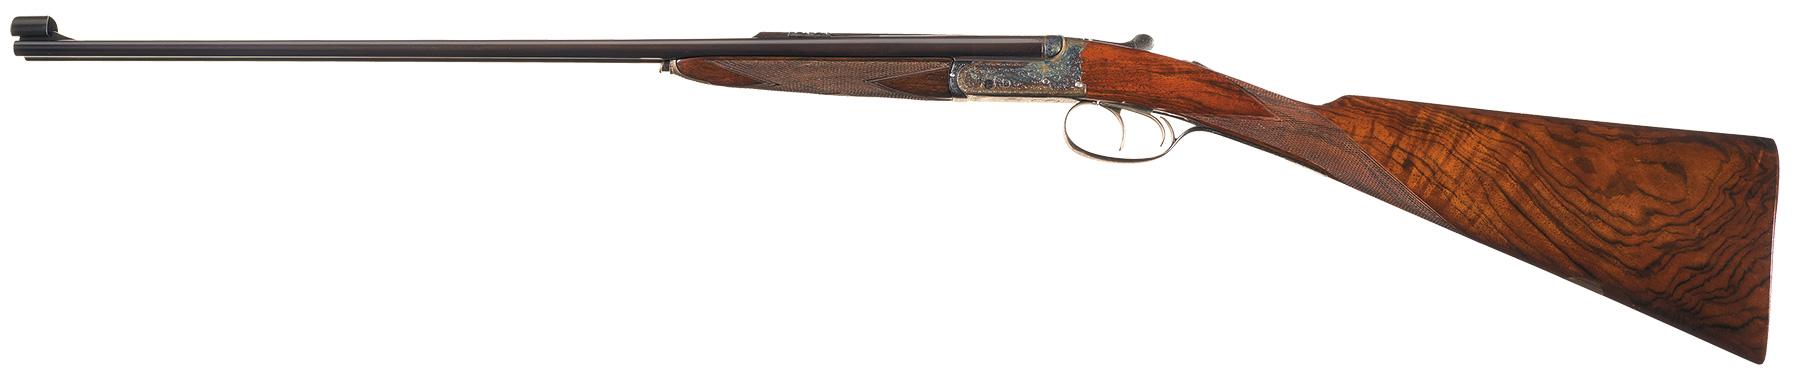 Churchill 22 Hornet double rifle